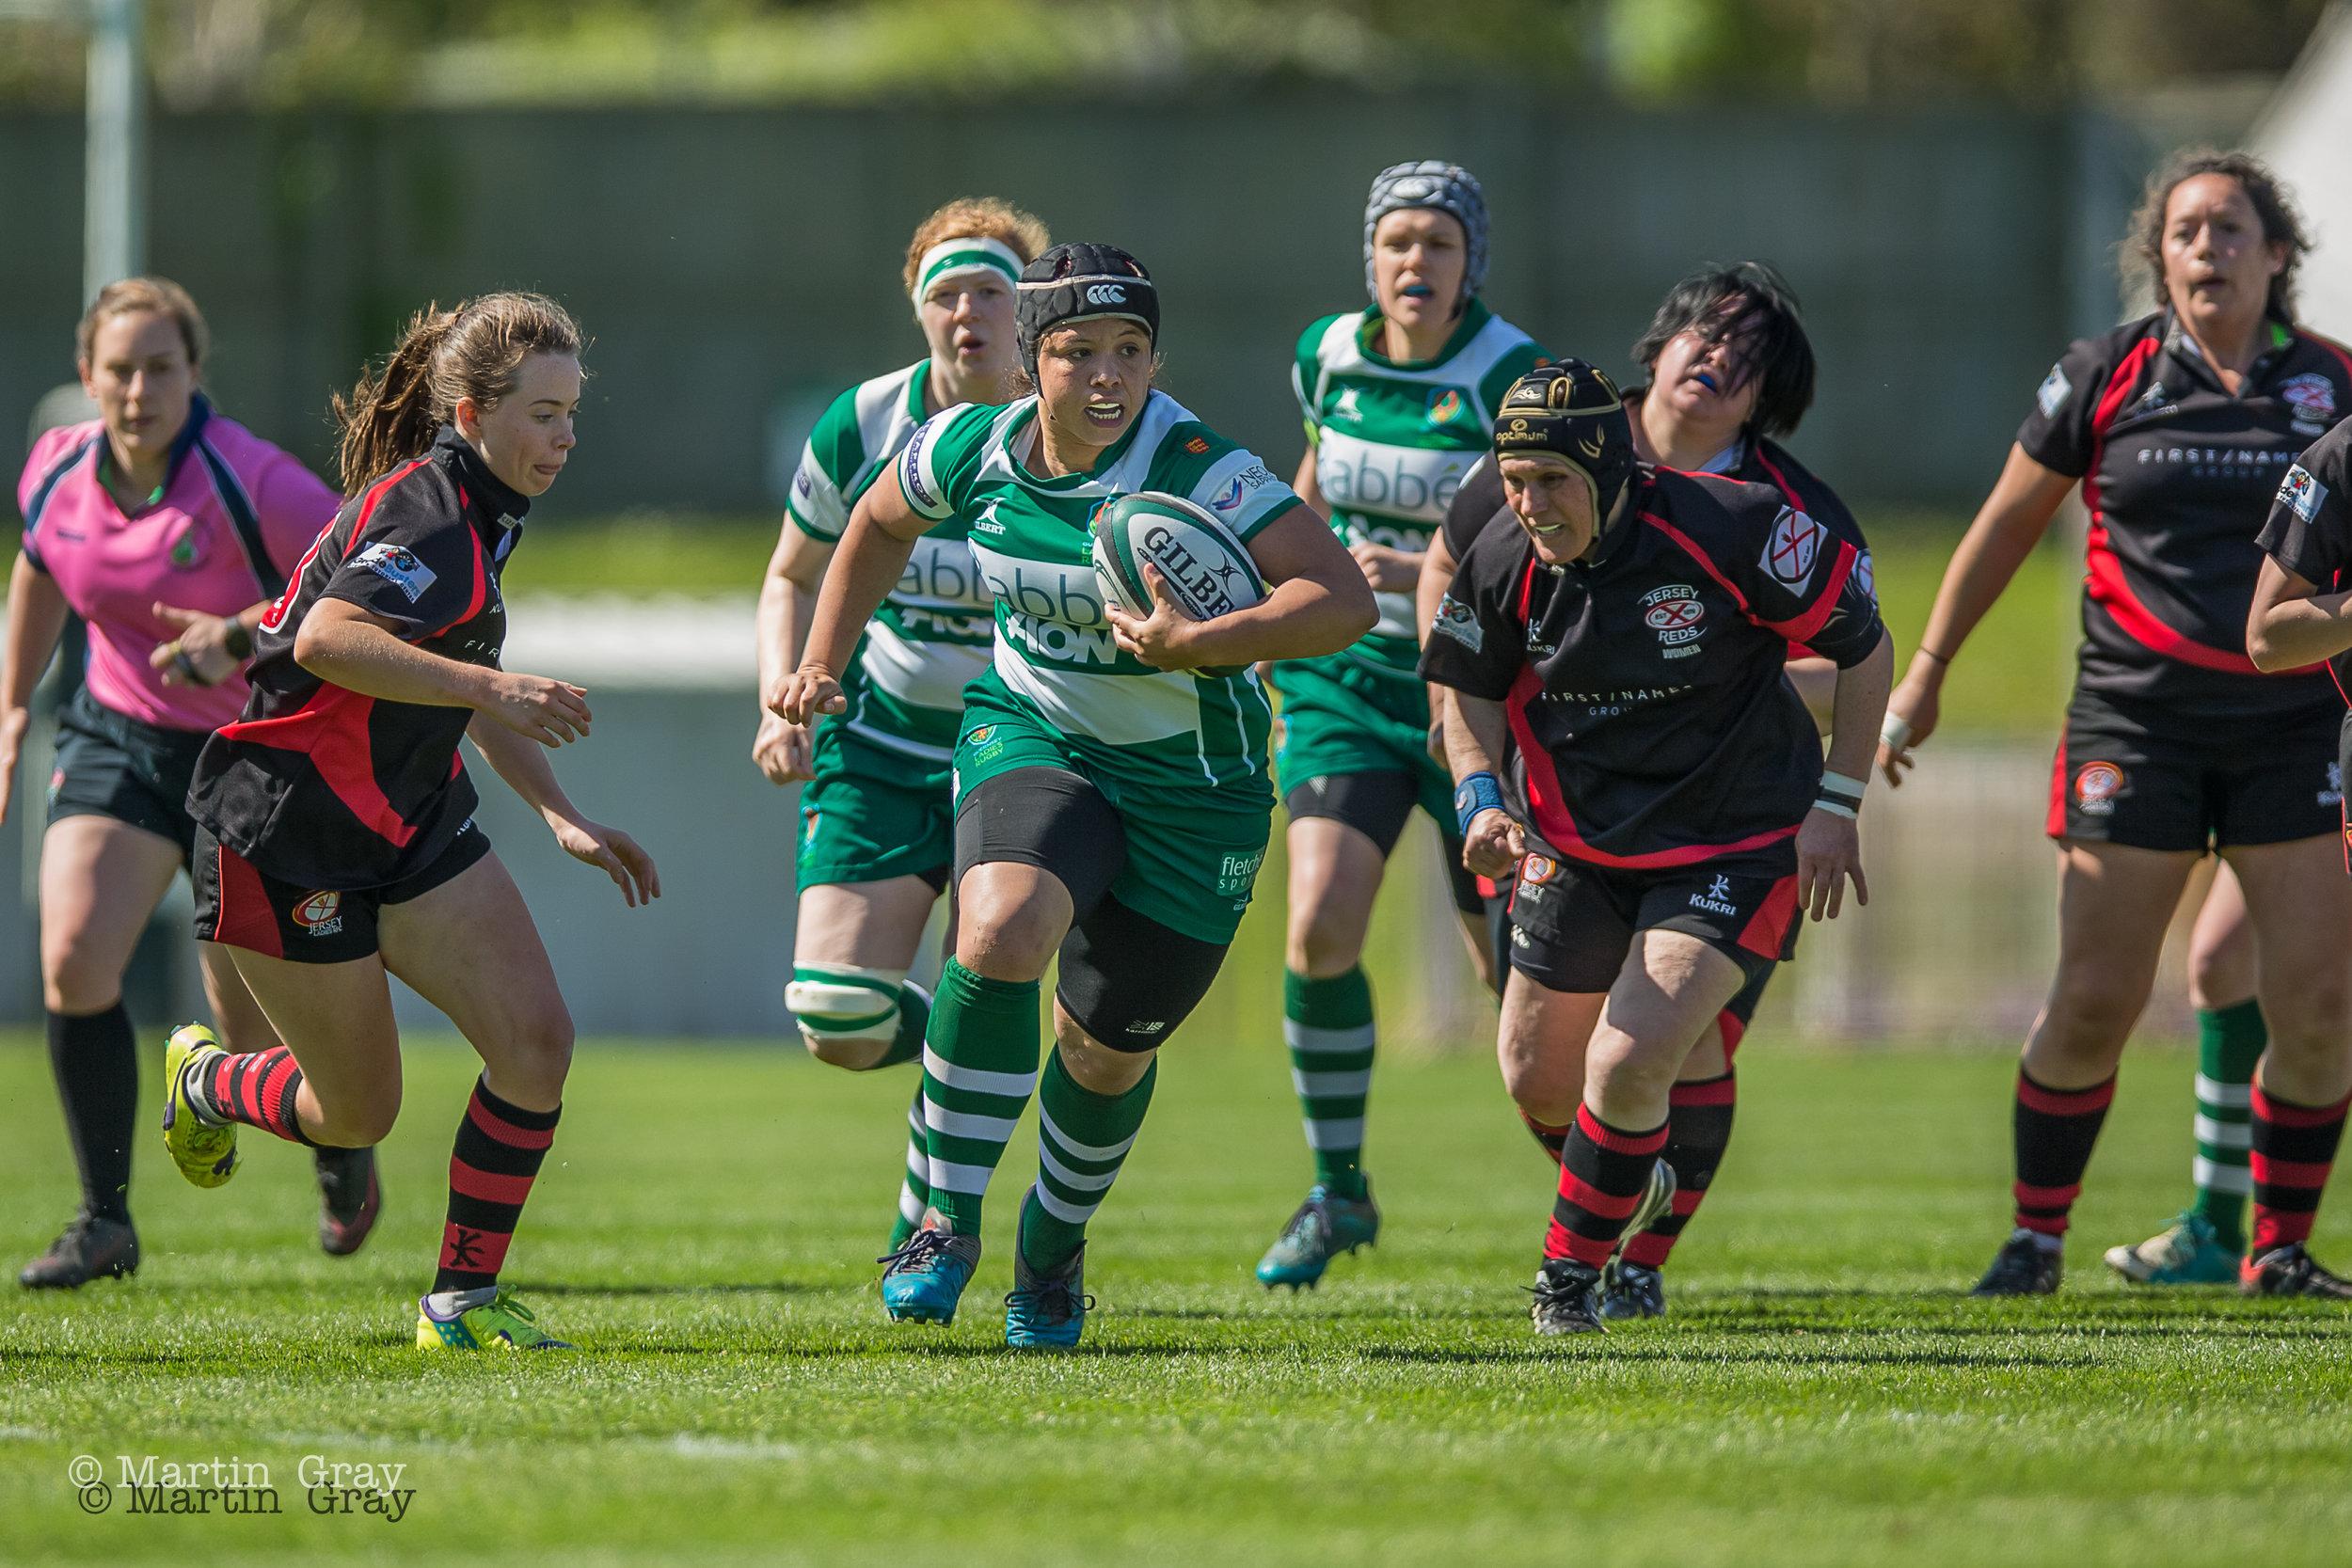 Guernsey Ladies v Jersey - Siam Trophy 2018... GLR win 40-0